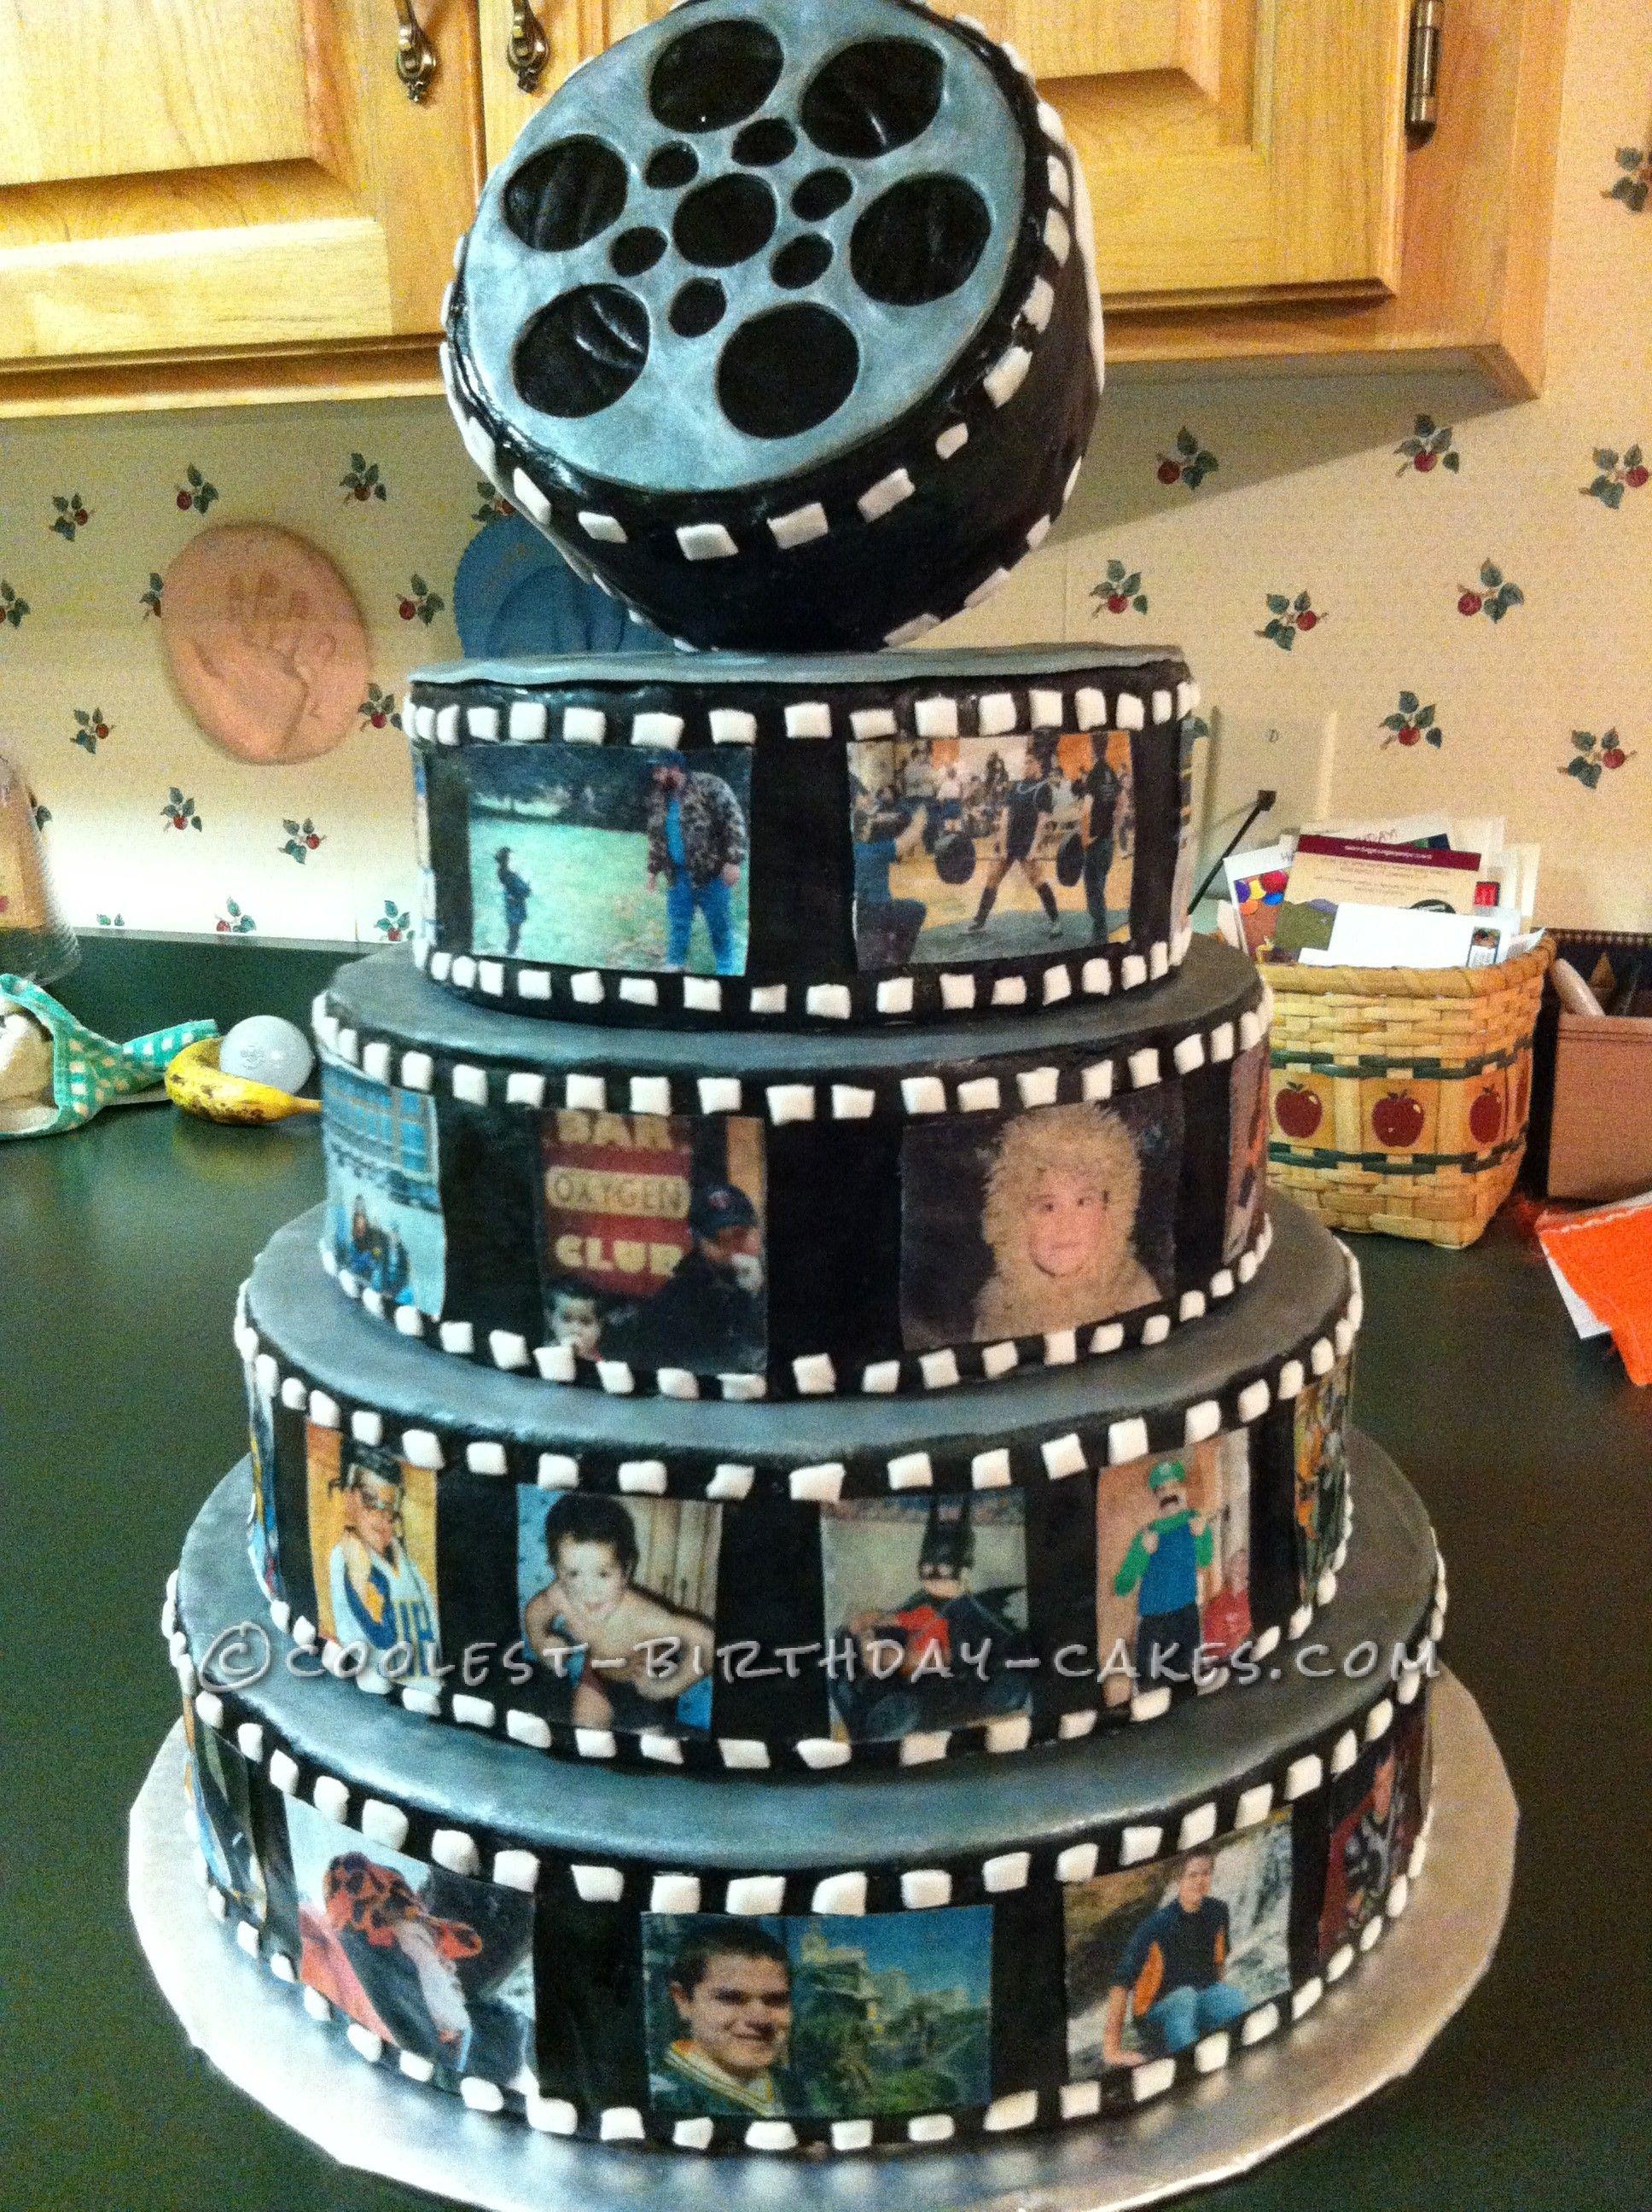 Coolest Snap Shot Photo Reel Birthday Cake Boys 18th Birthday Cake Themed Cakes Birthday Cake Pictures